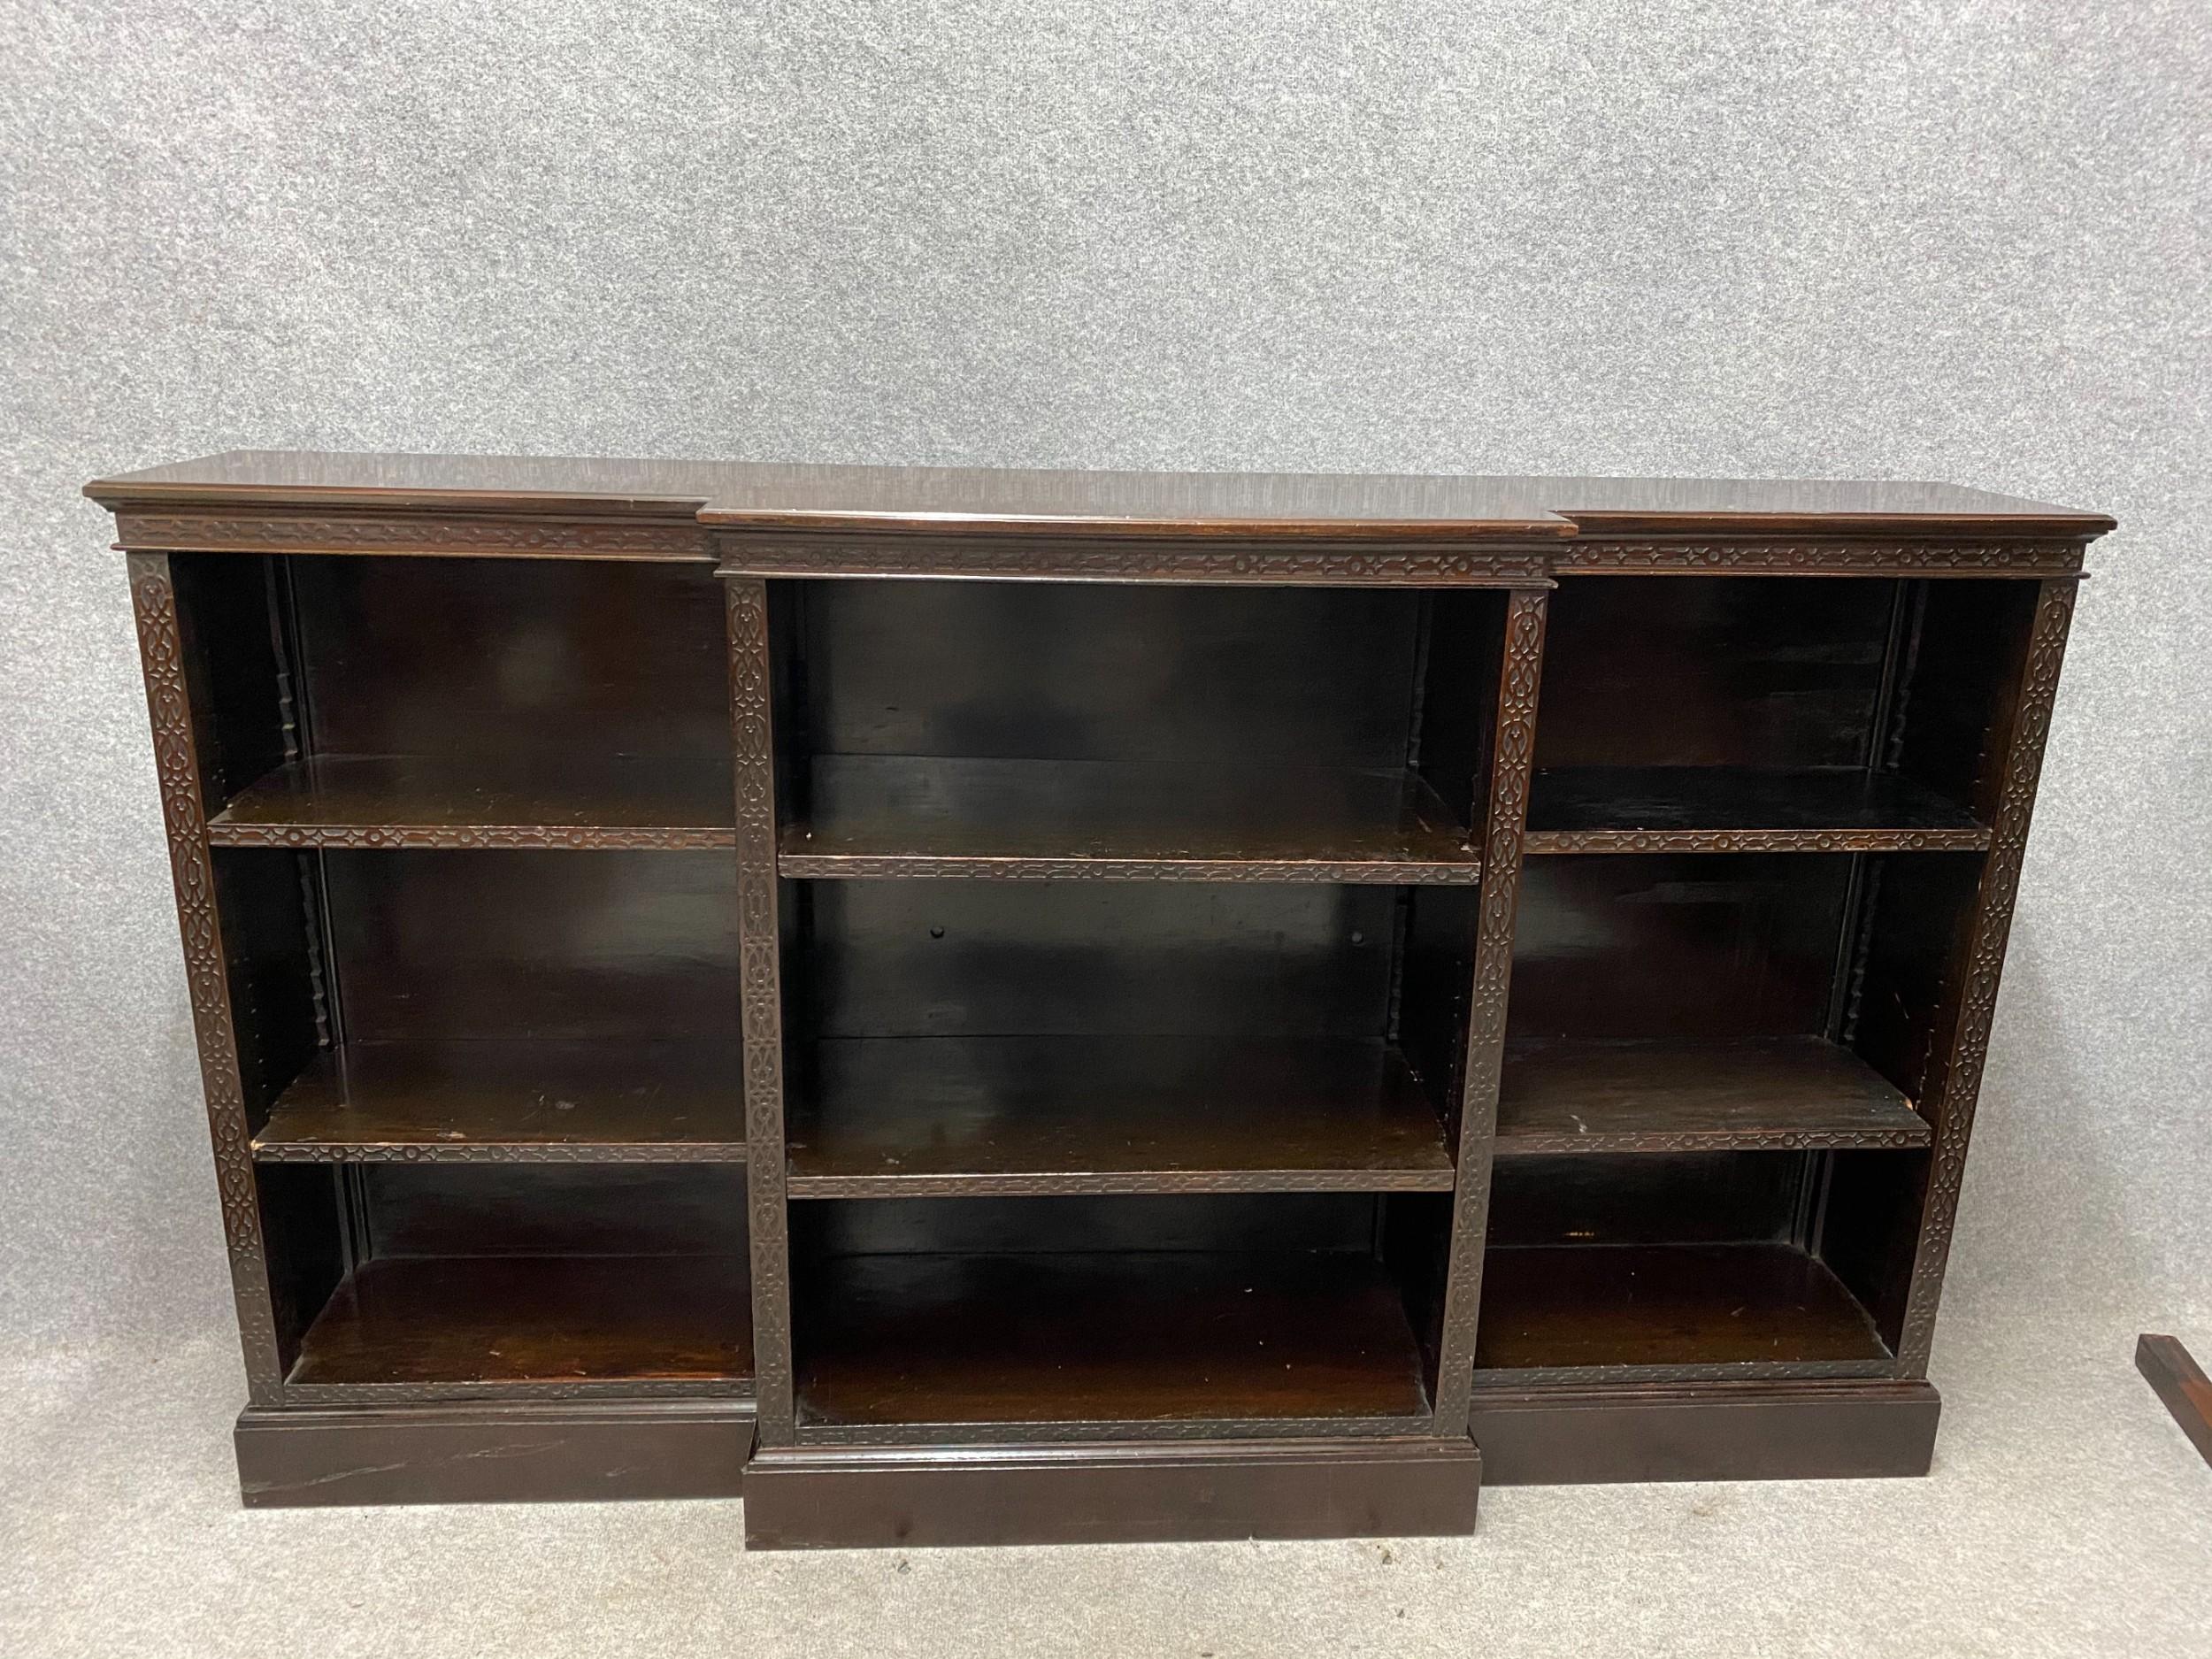 edwardian mahogany breakfront open bookcase